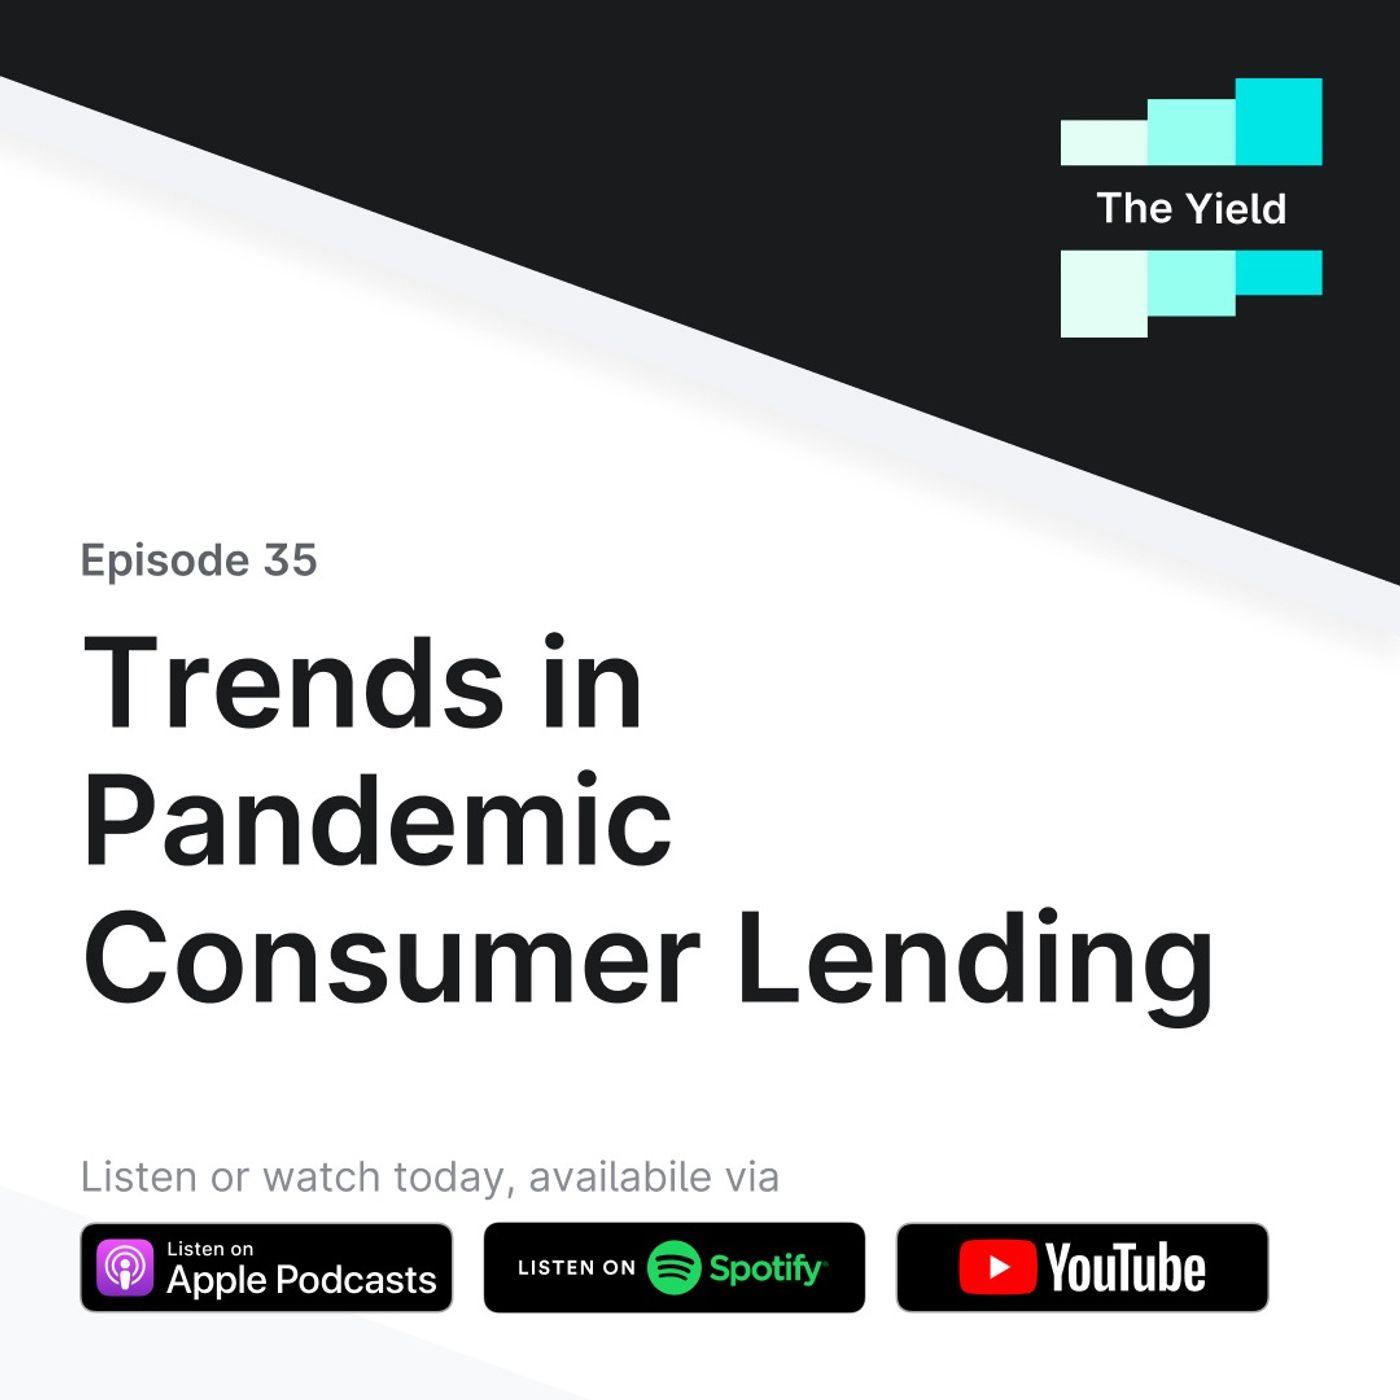 Trends in Pandemic Consumer Lending